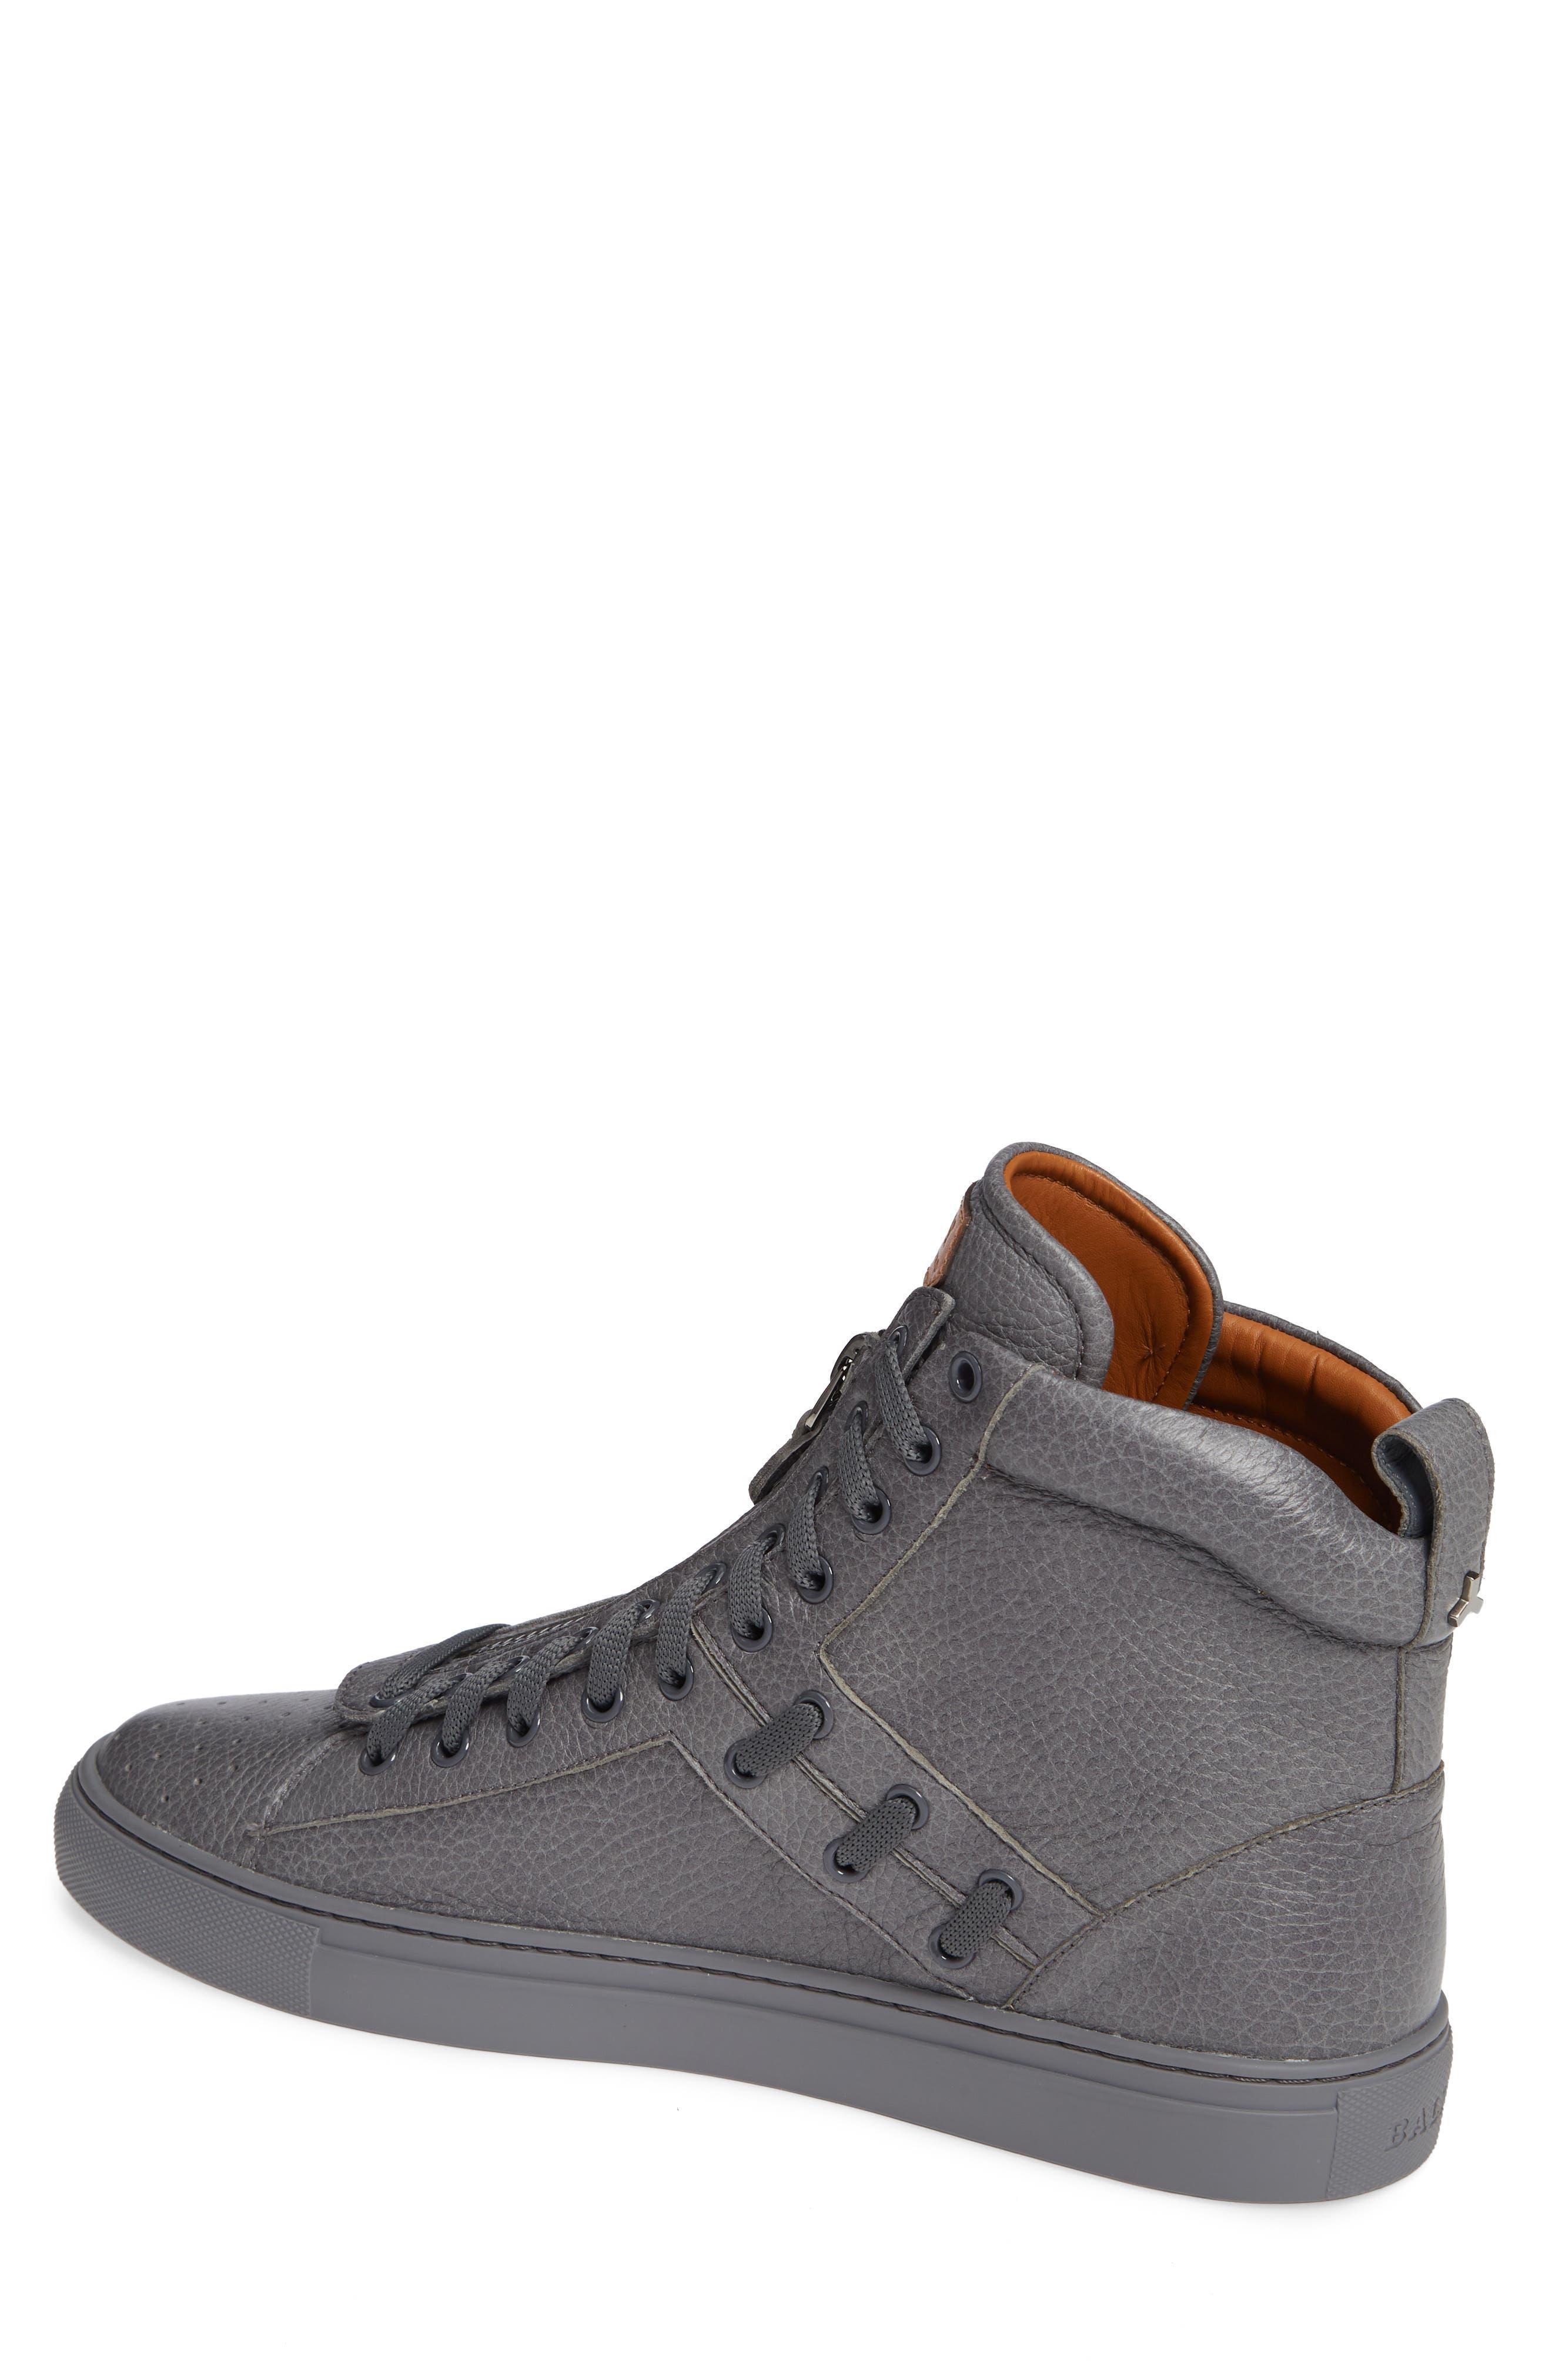 Hekem High-Top Sneaker,                             Alternate thumbnail 2, color,                             GARCONE GREY